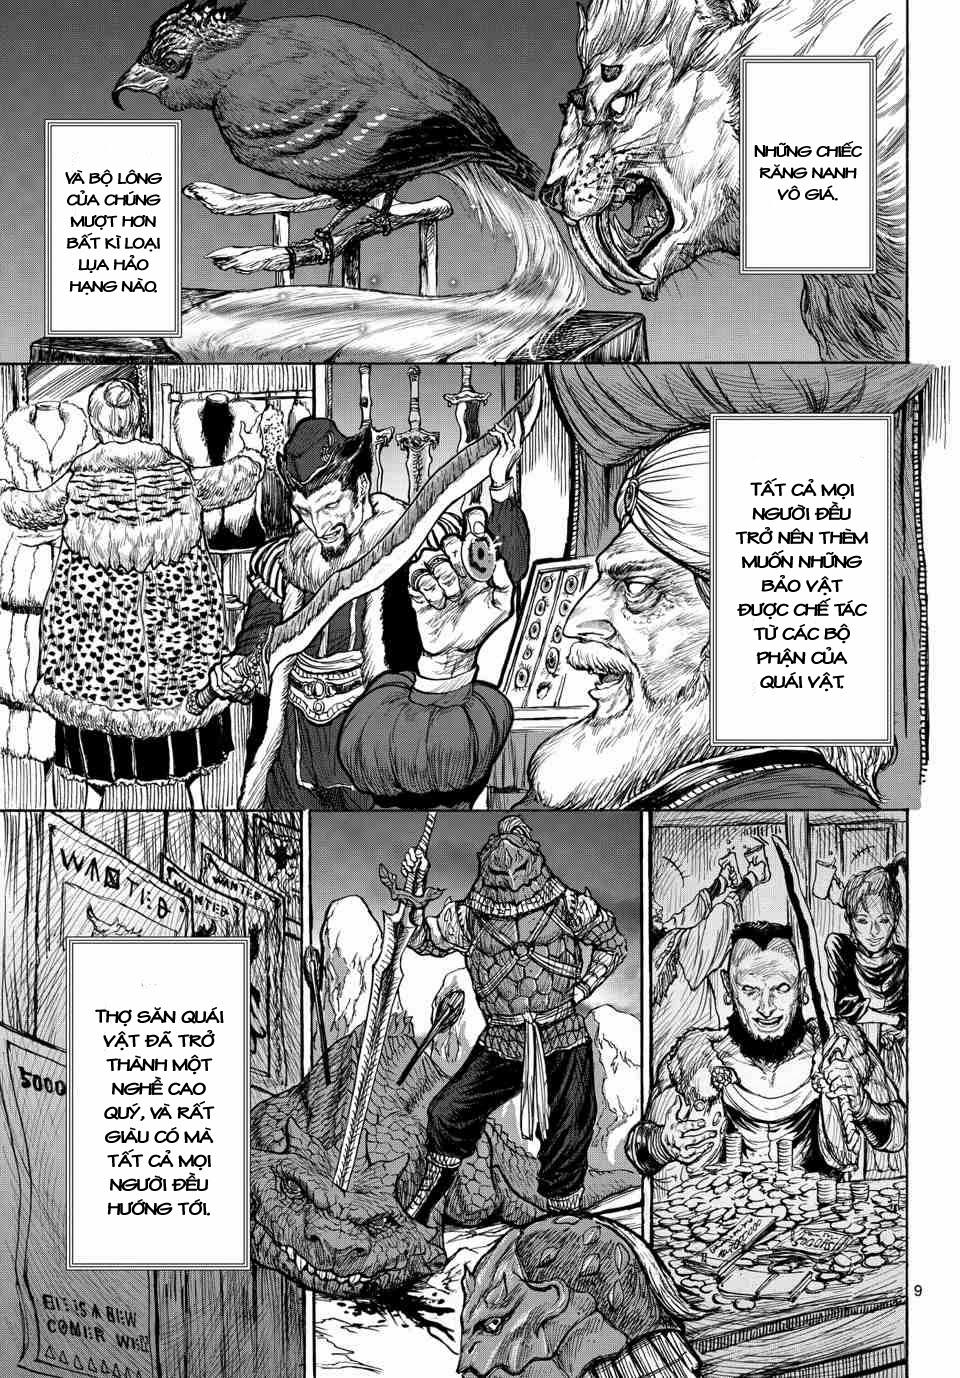 Monster X Monster chapter 1a trang 8